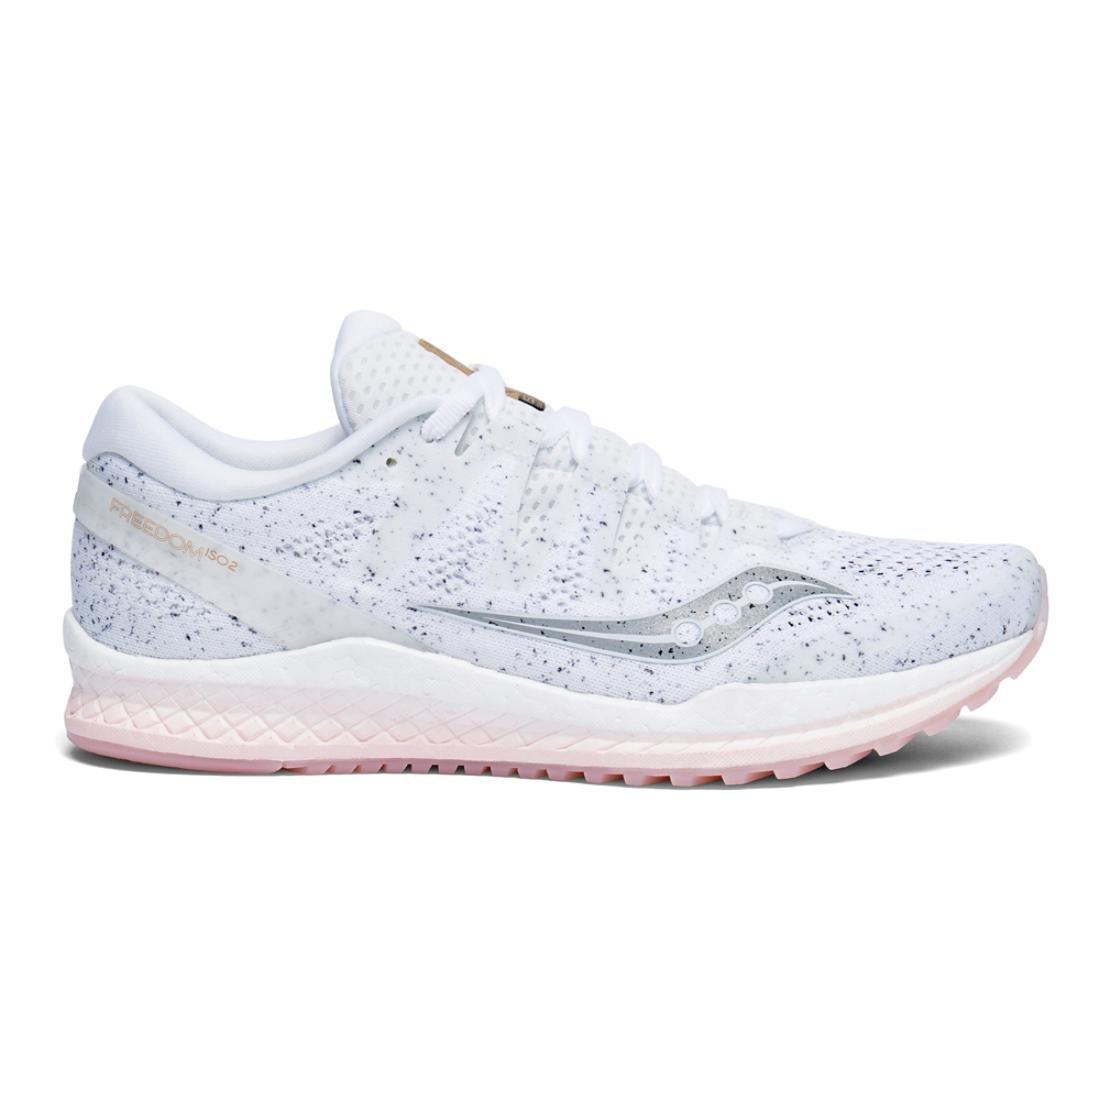 Saucony Women's Freedom ISO 2 Running Shoes B078PP2NGN 11 M US|White